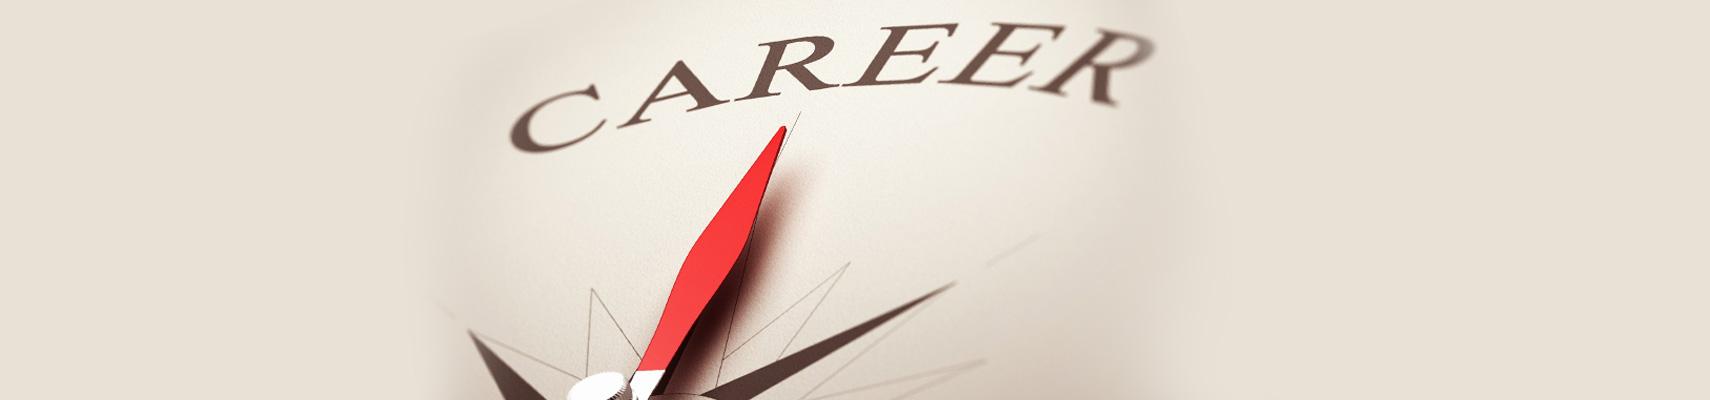 Nuhydro Careers